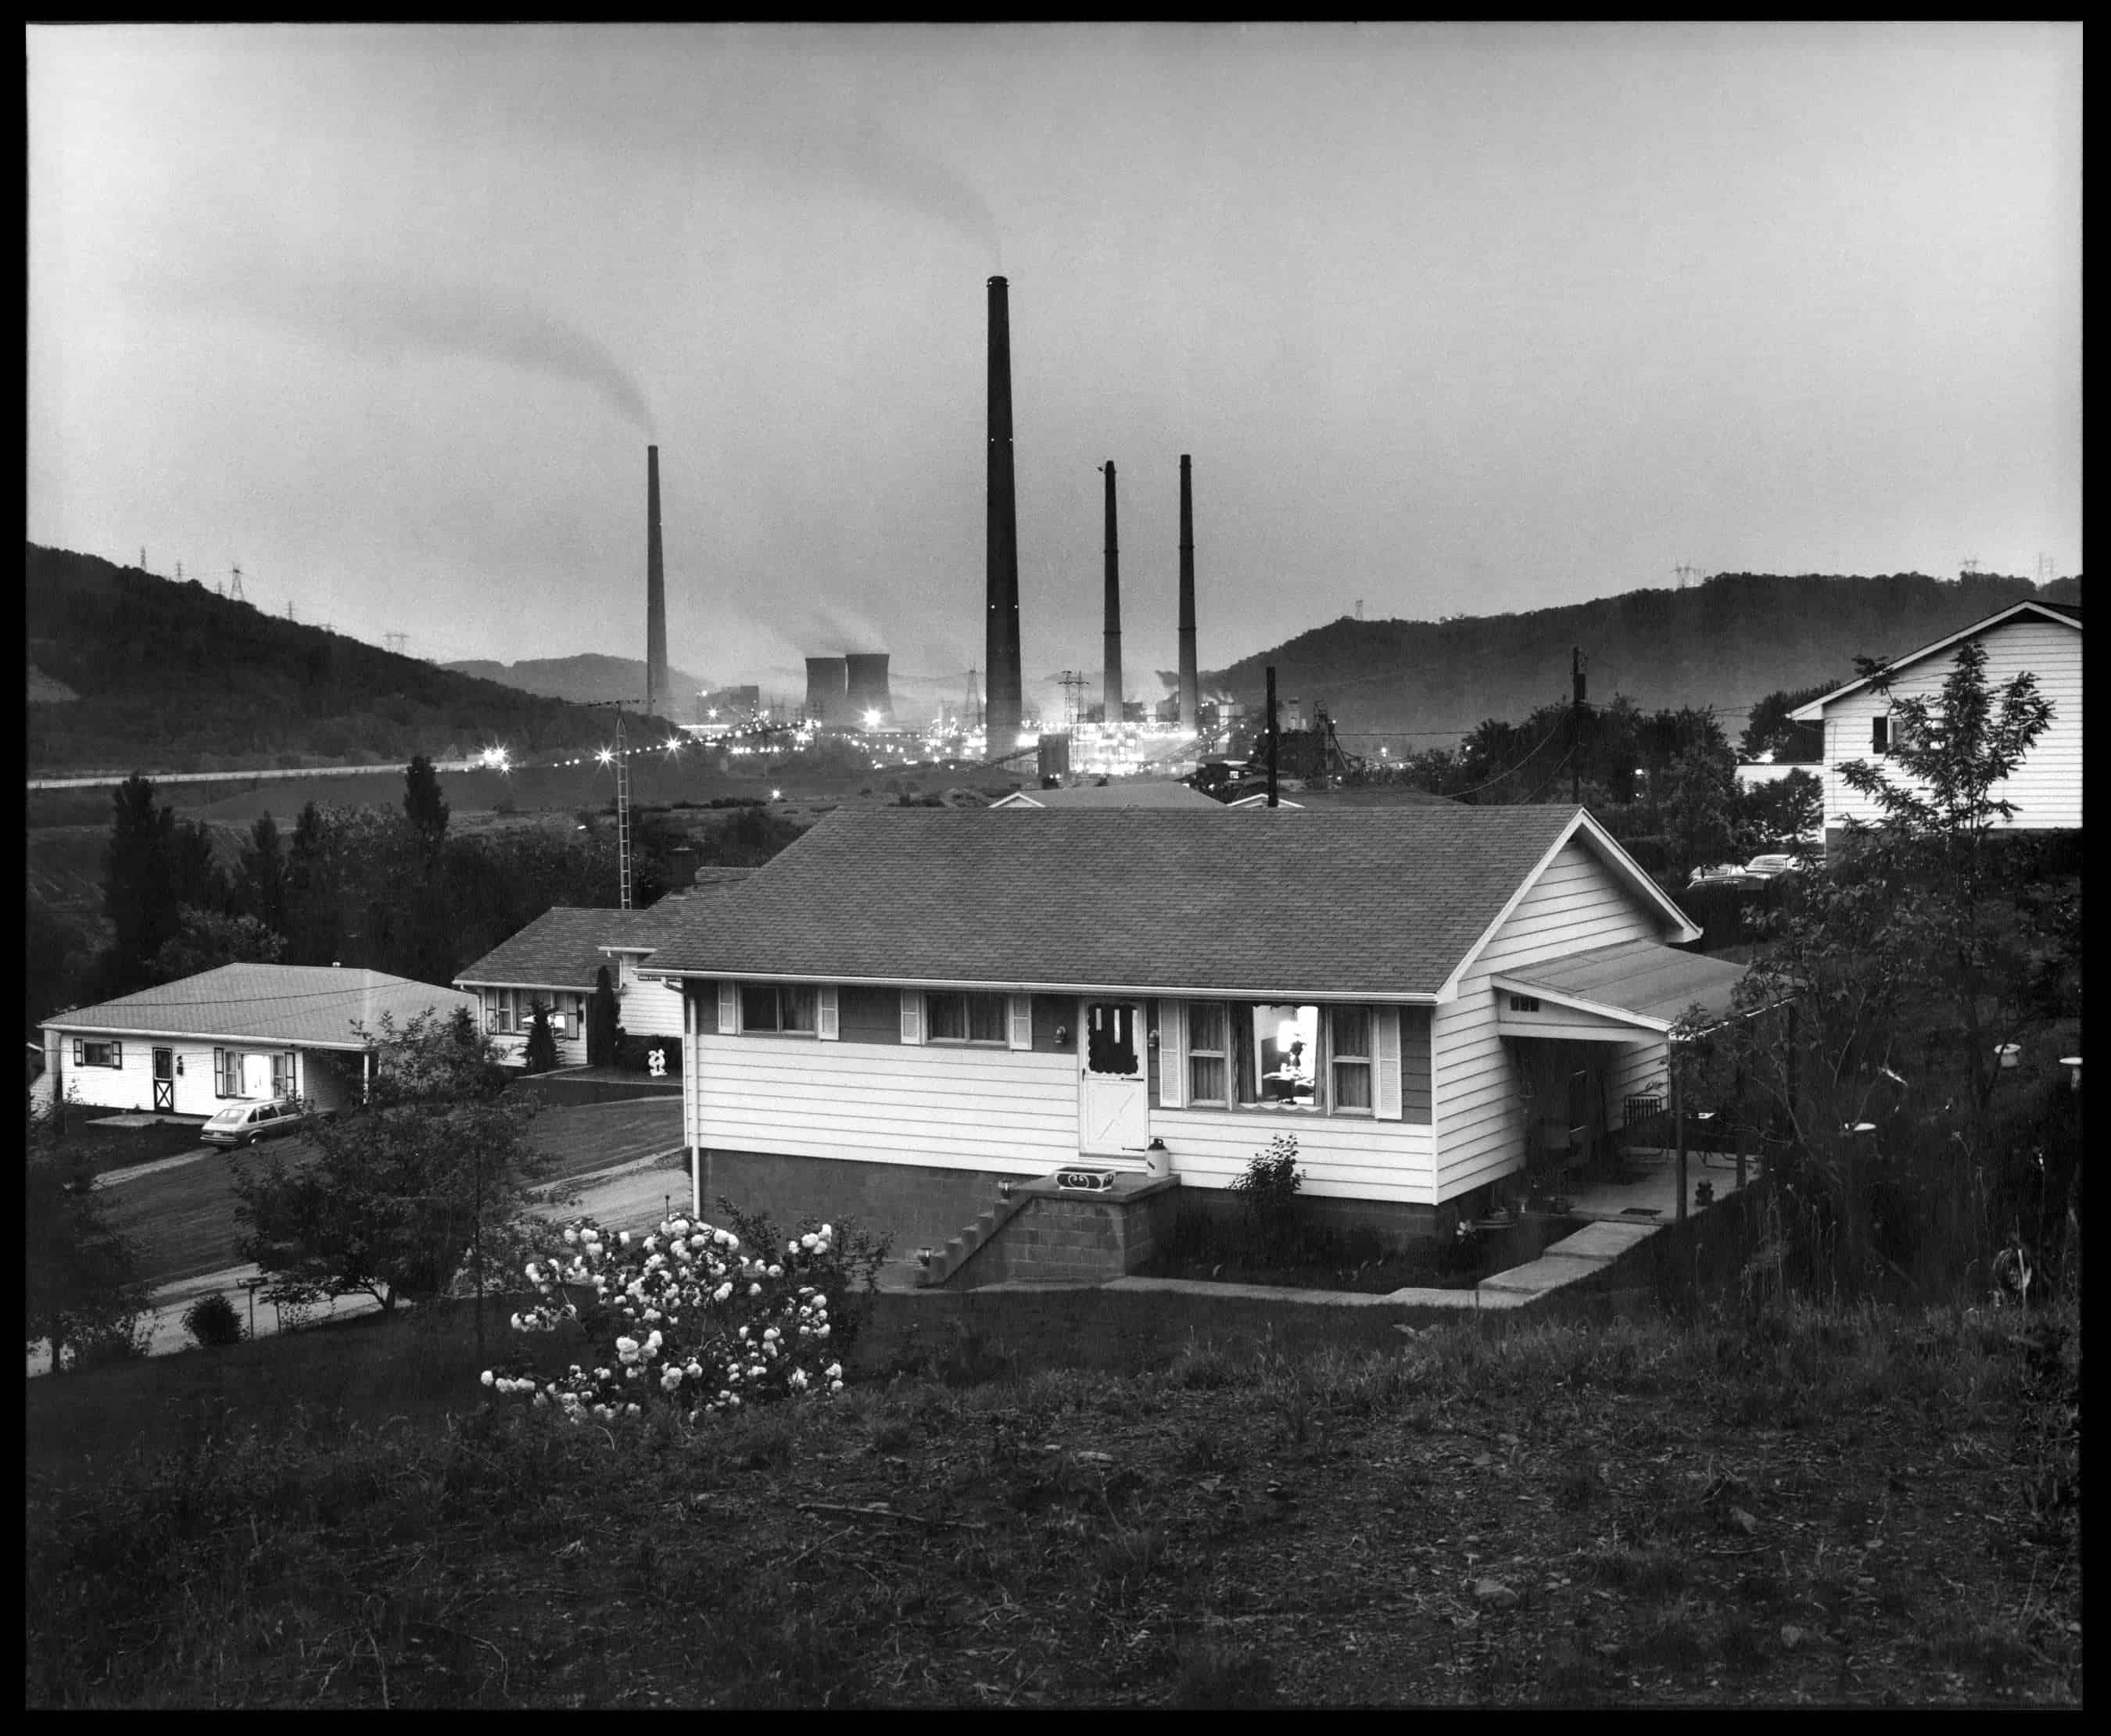 Home and Powerplant. Powhatan Point, Ohio